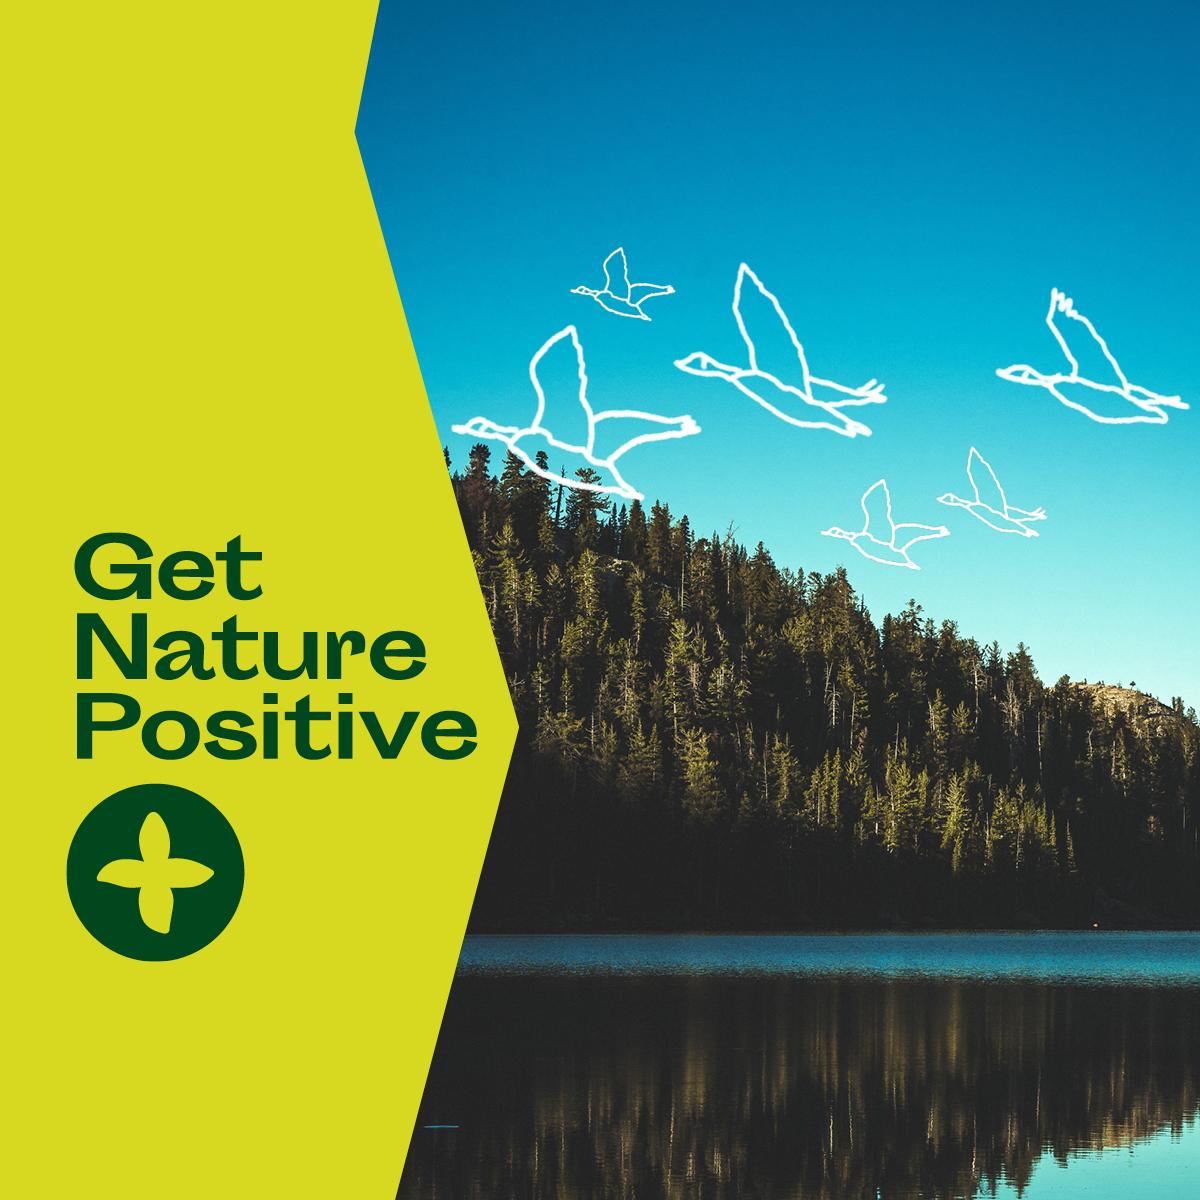 Get Nature Positive